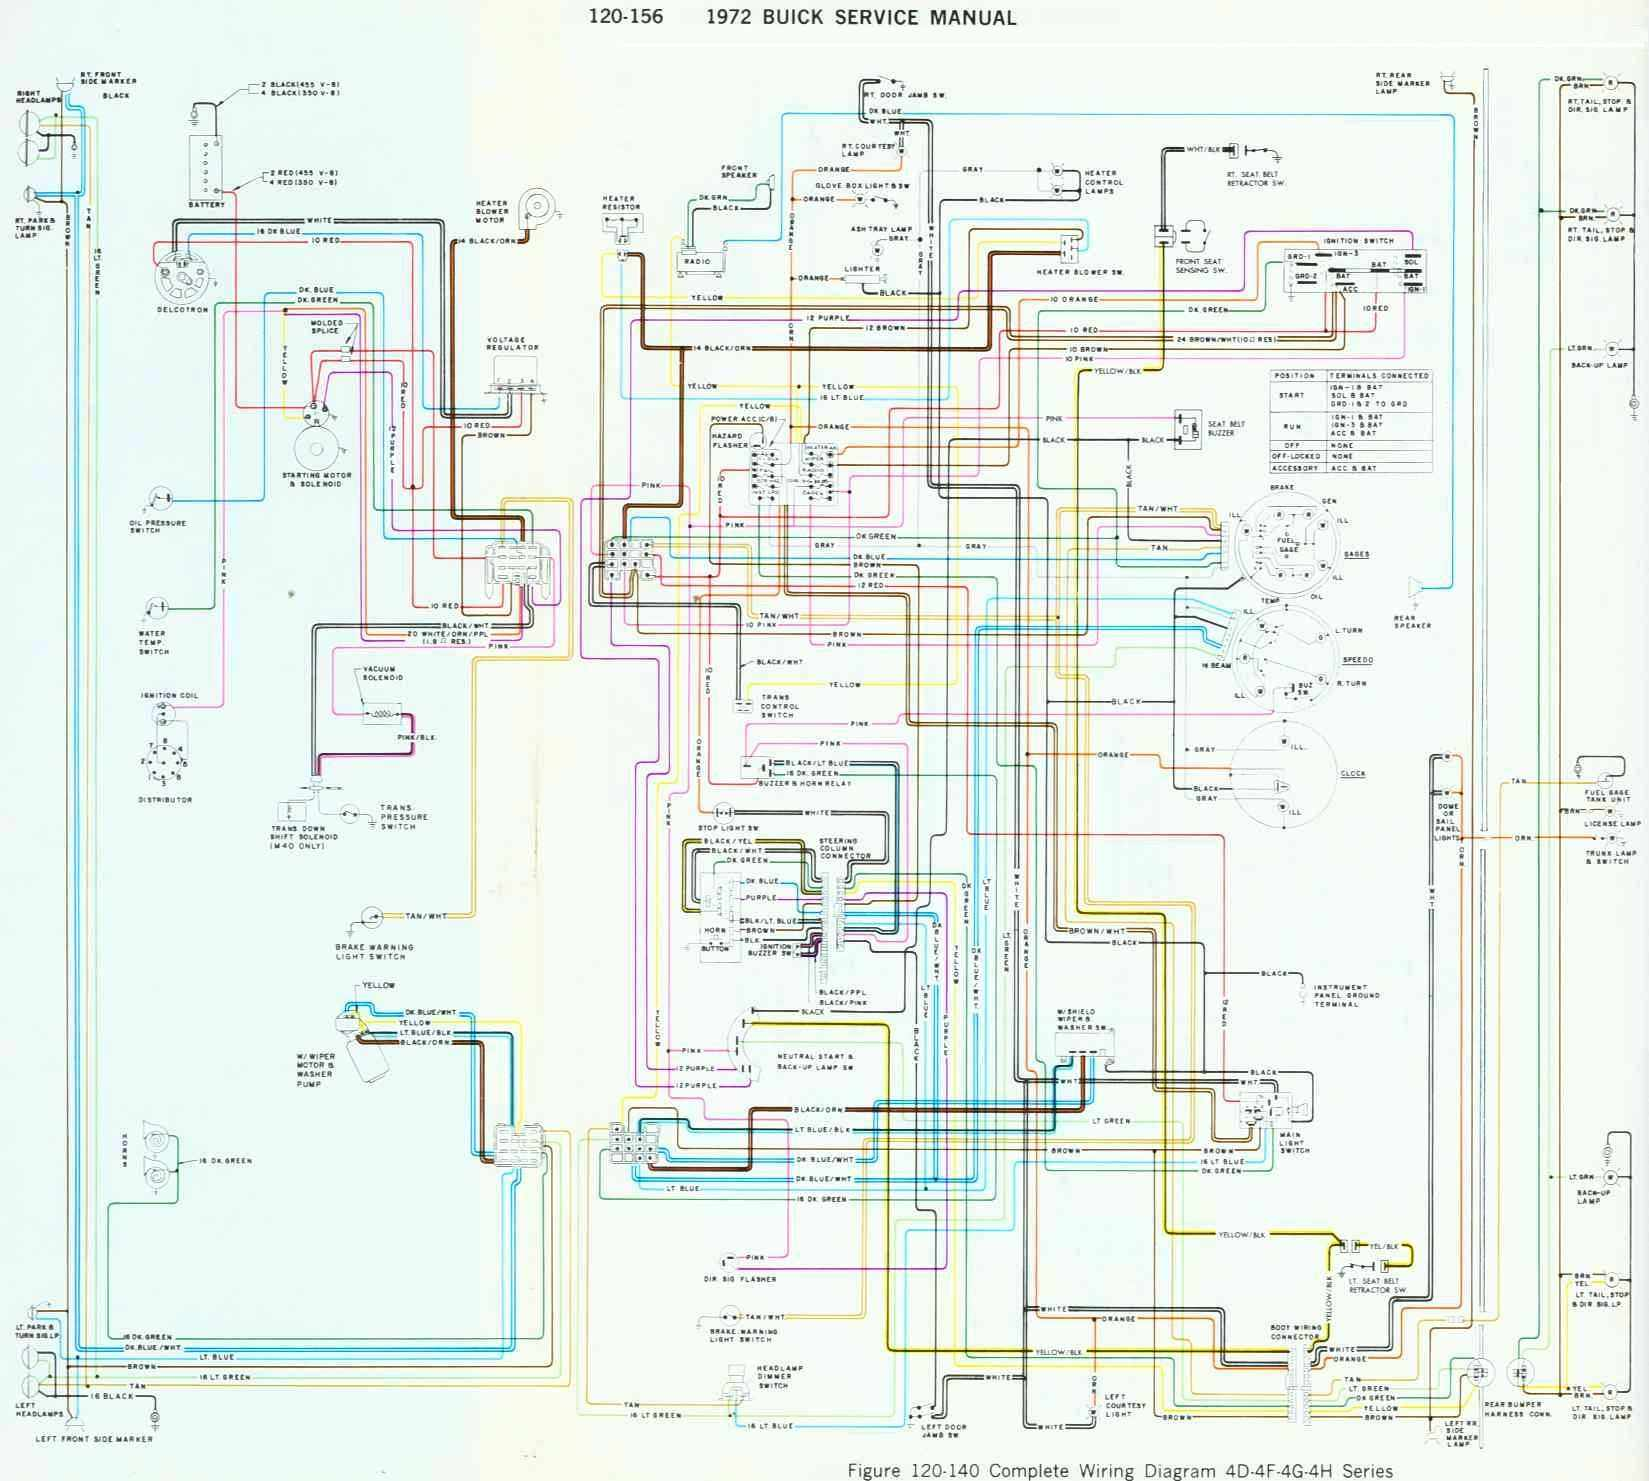 1972 avion wiring diagram enthusiast wiring diagrams u2022 rh rasalibre co Light Switch Wiring Diagram HVAC Wiring Diagrams